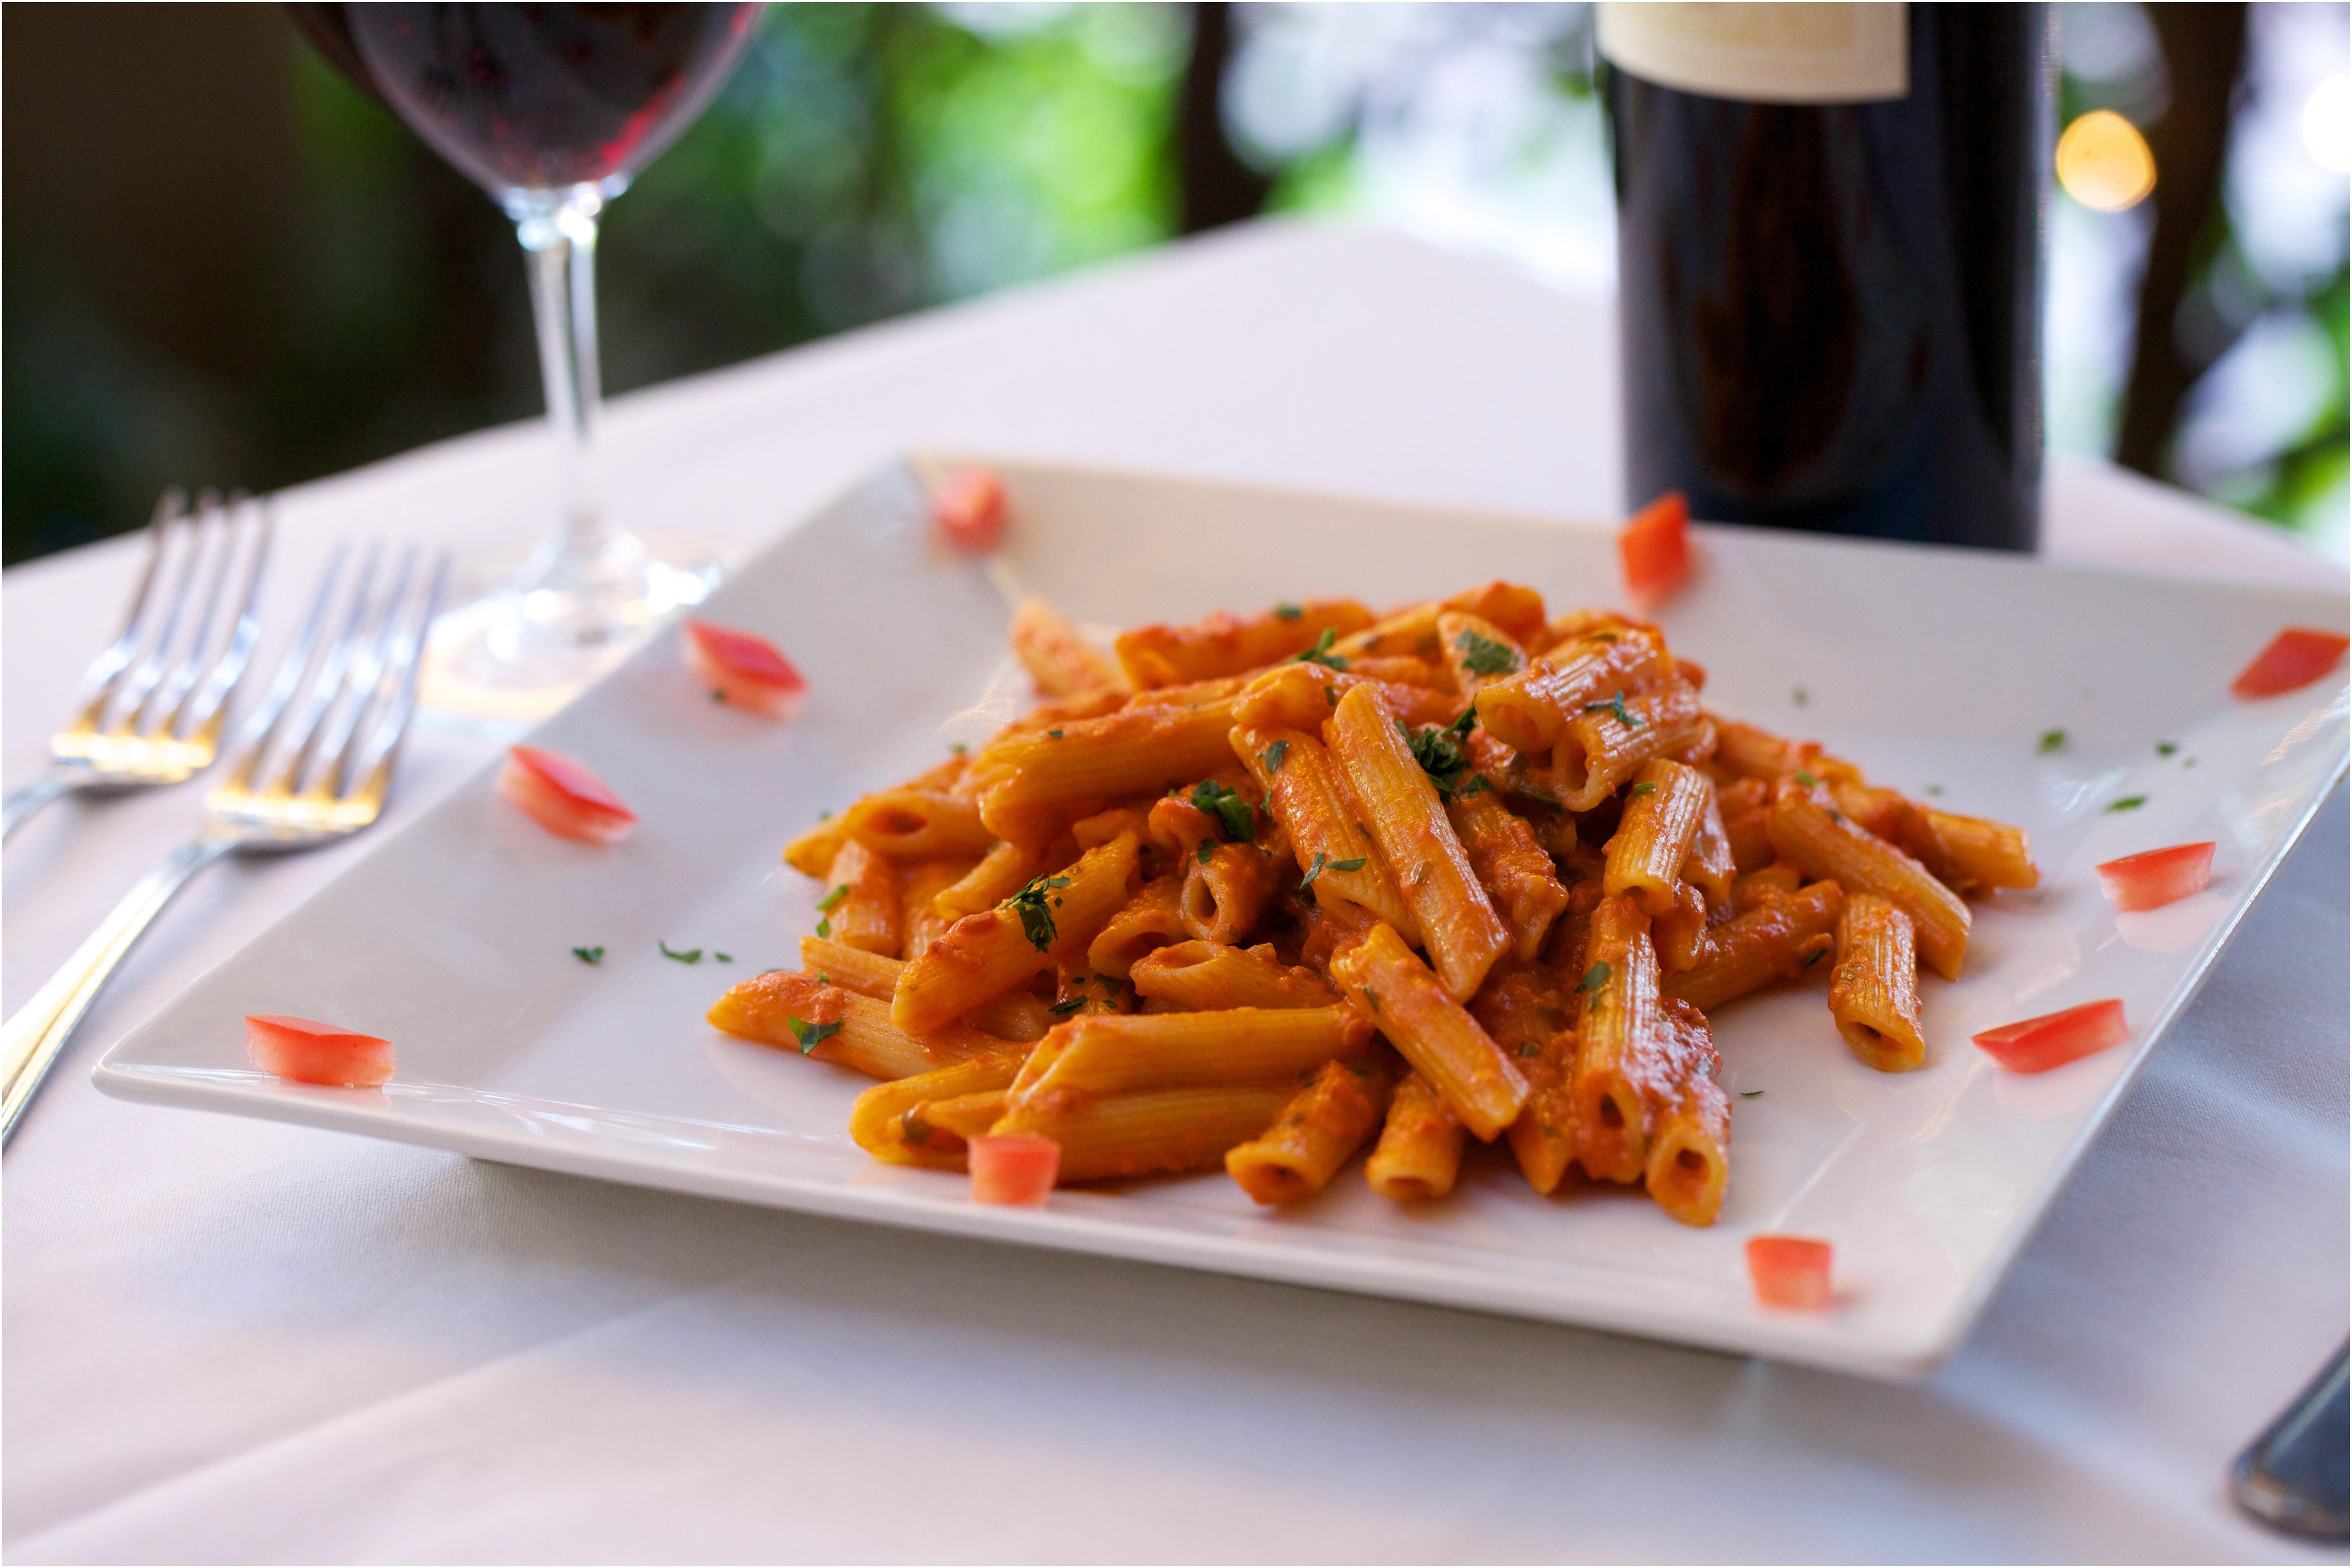 Best Italian Restaurants Newport Beach Ca Unique Best Italian Food In Newport Beach – Cbs Los Angeles